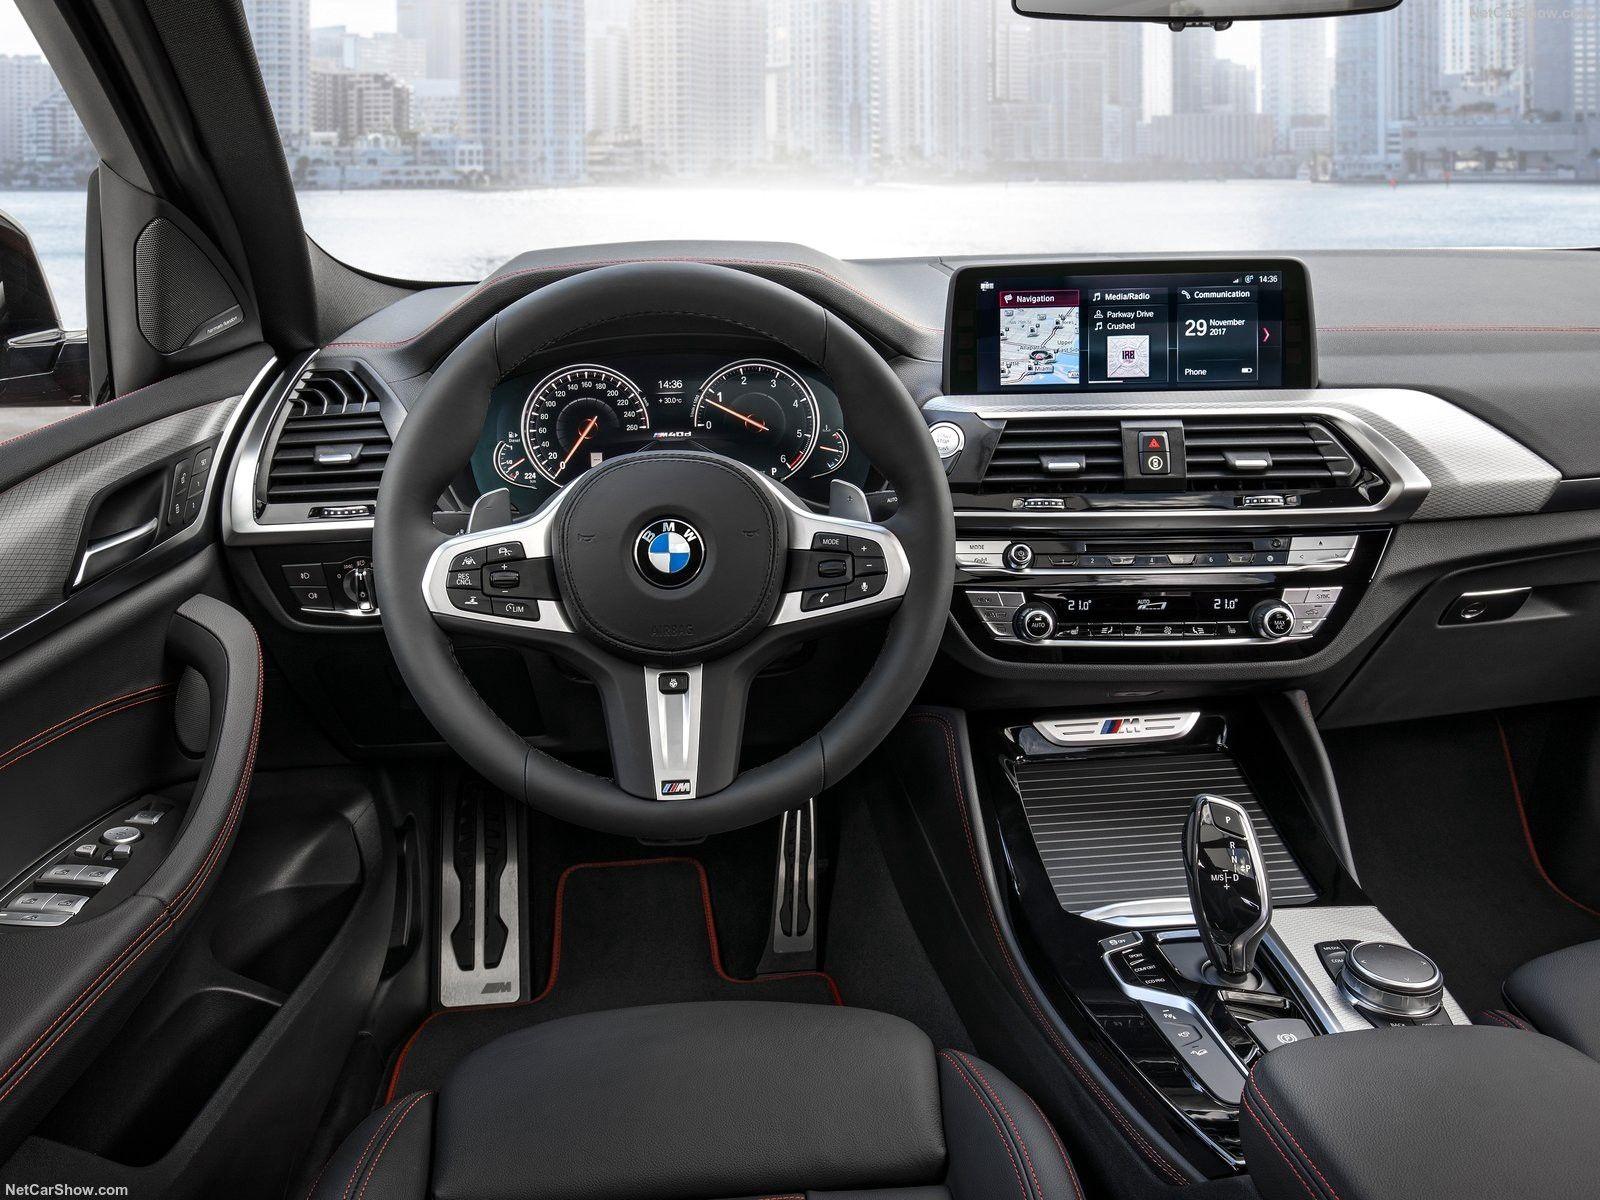 Modern Ui Design Of Automotive Hmi Auto Dashboards Apps Bmw X4